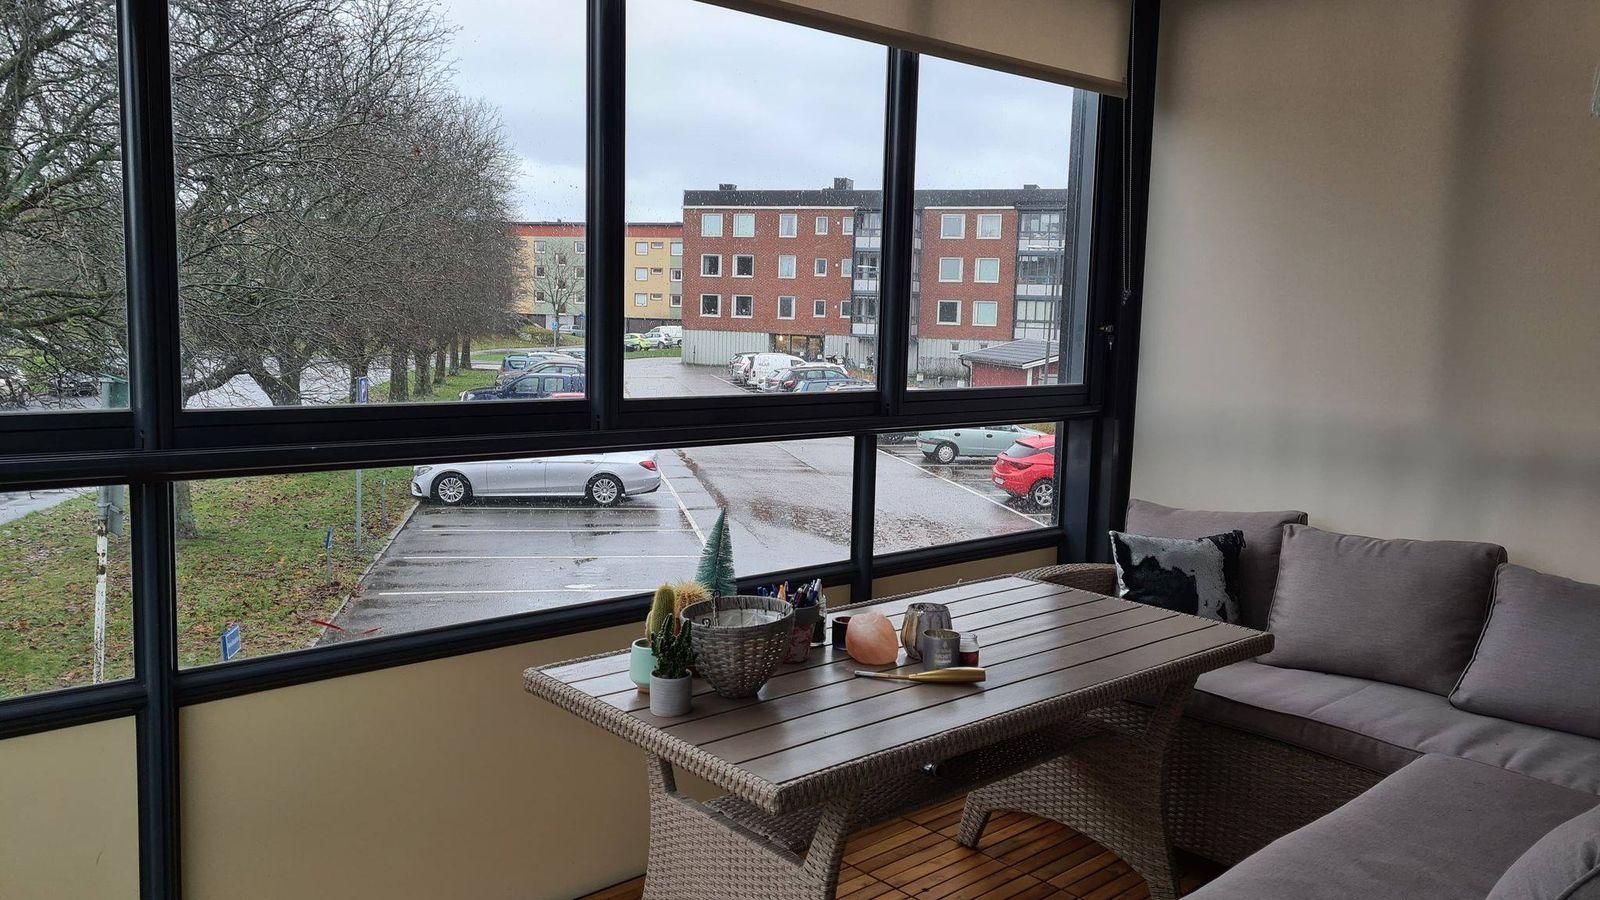 Ledig lägenhet i Oxelösund